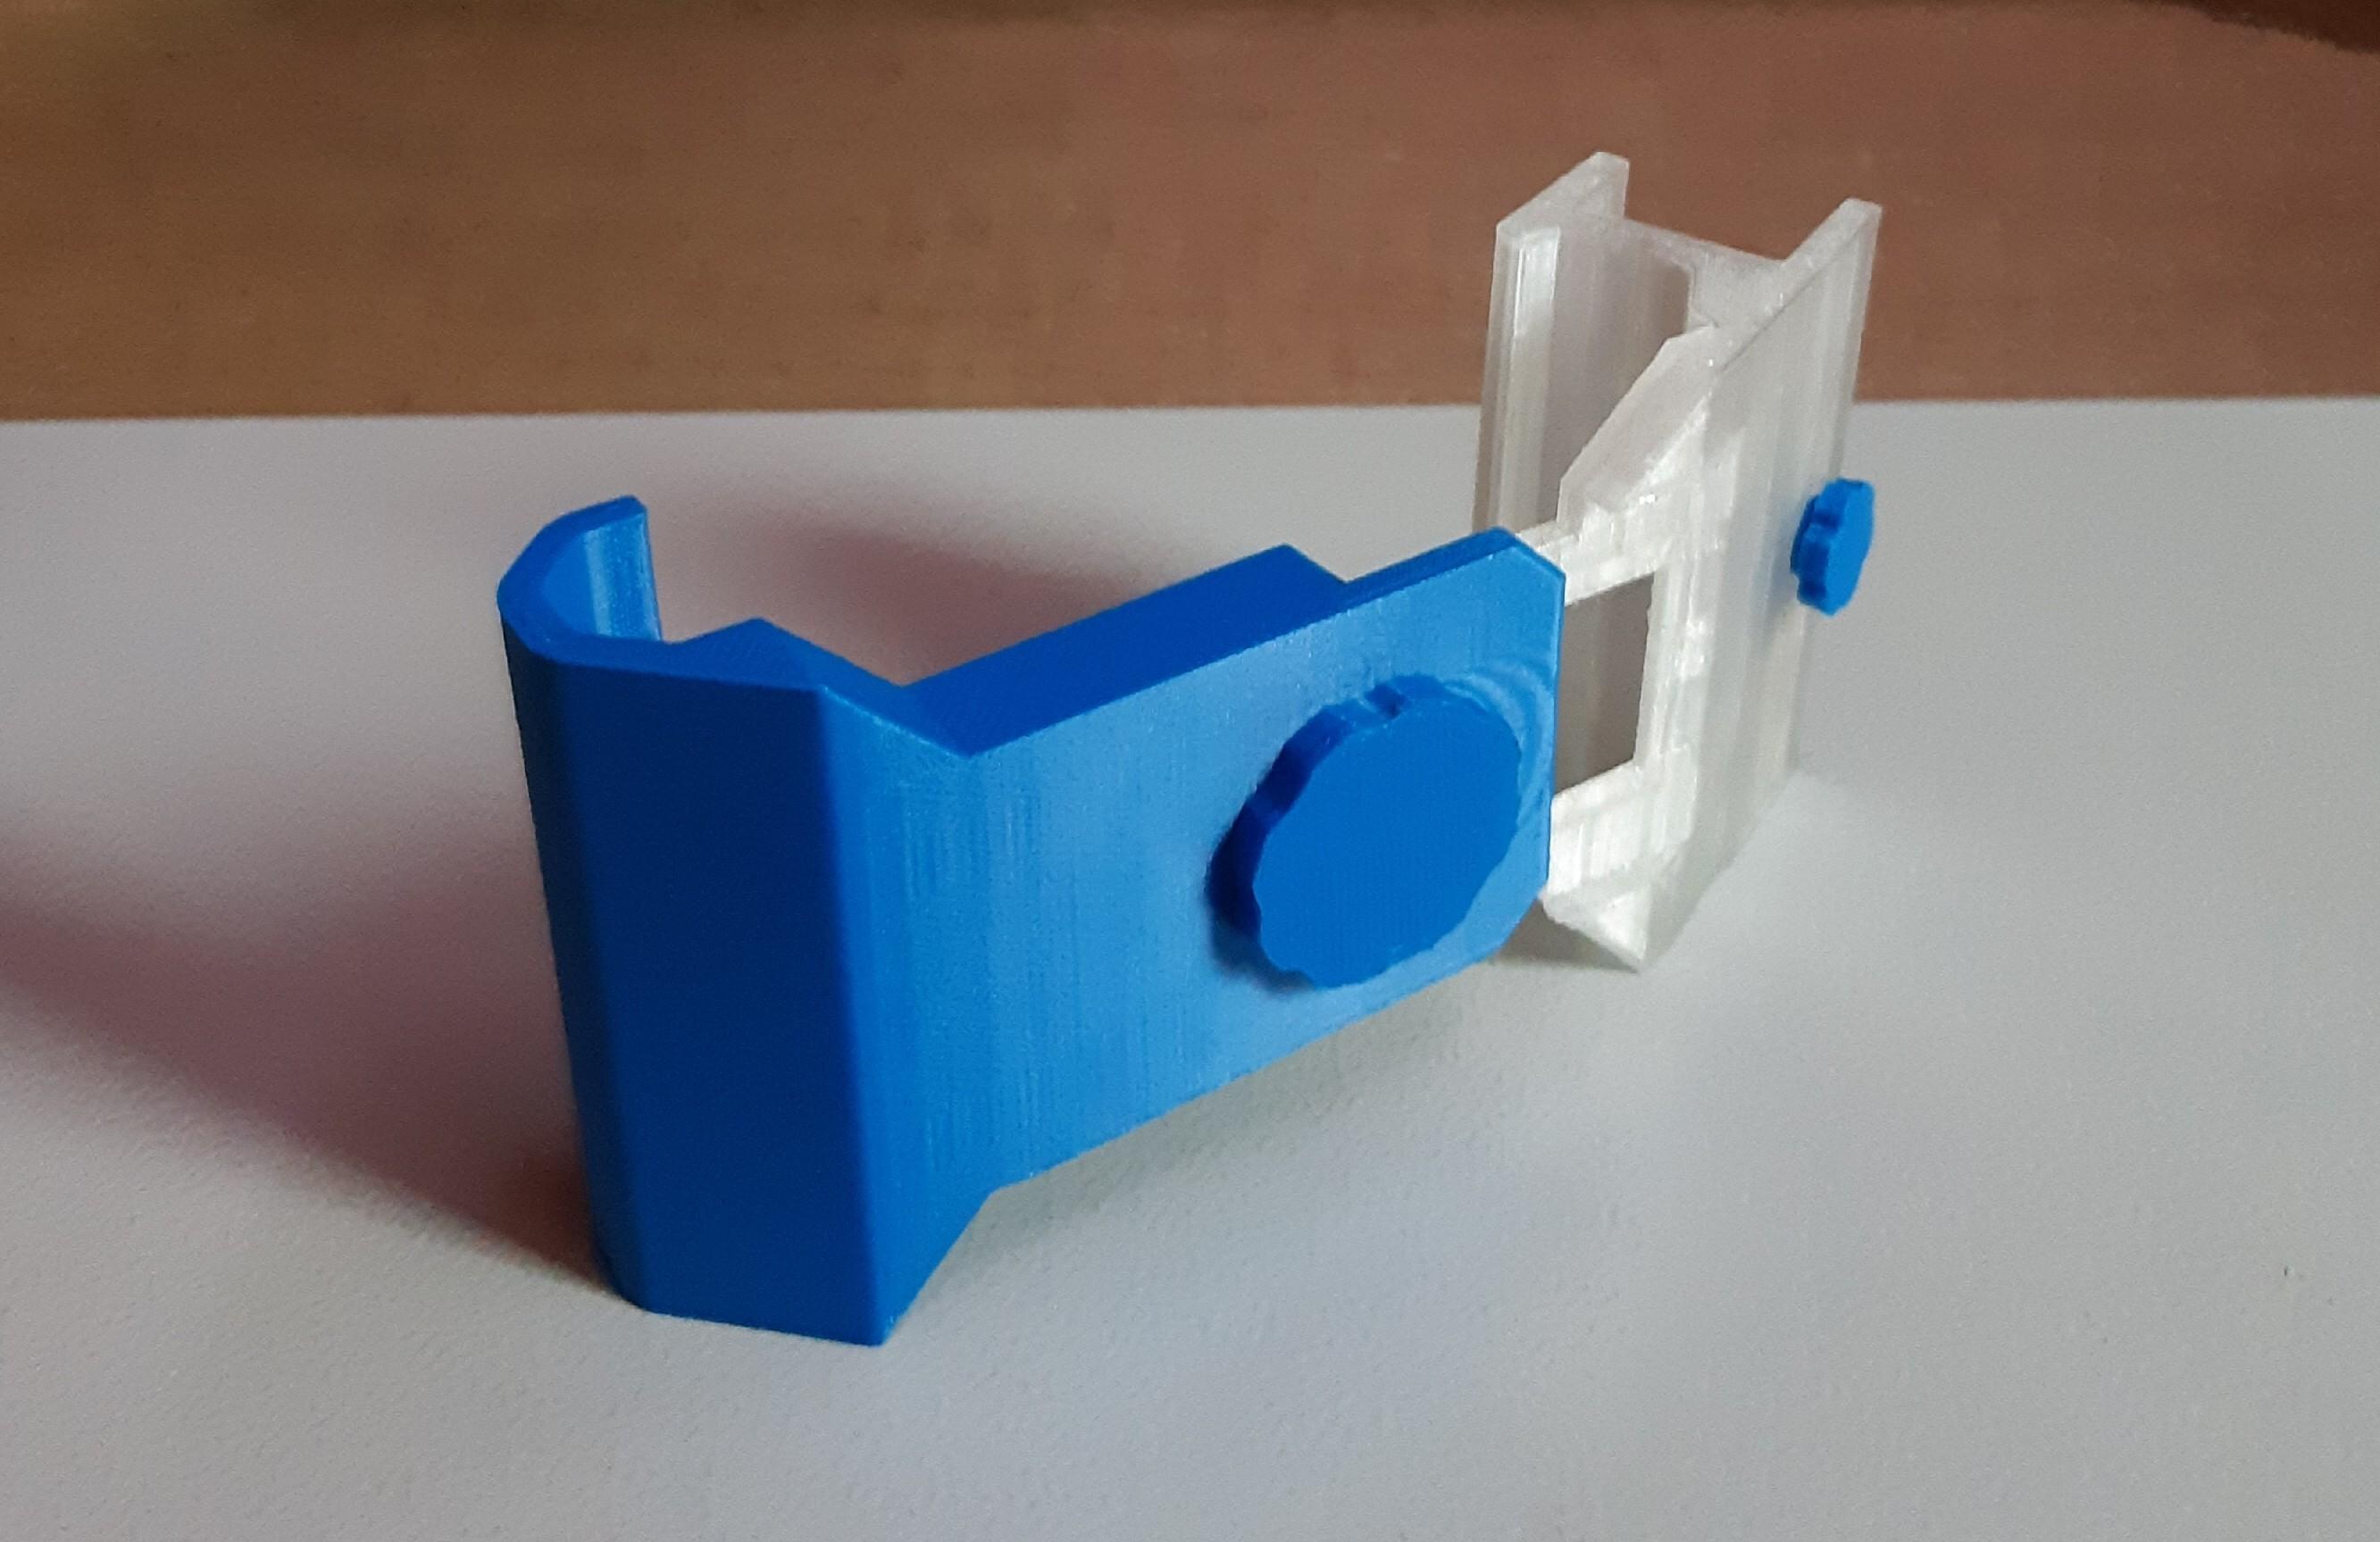 PhoneNextTo_iguigui_02.jpg Download free STL file Phone Next To • 3D print model, iguigui